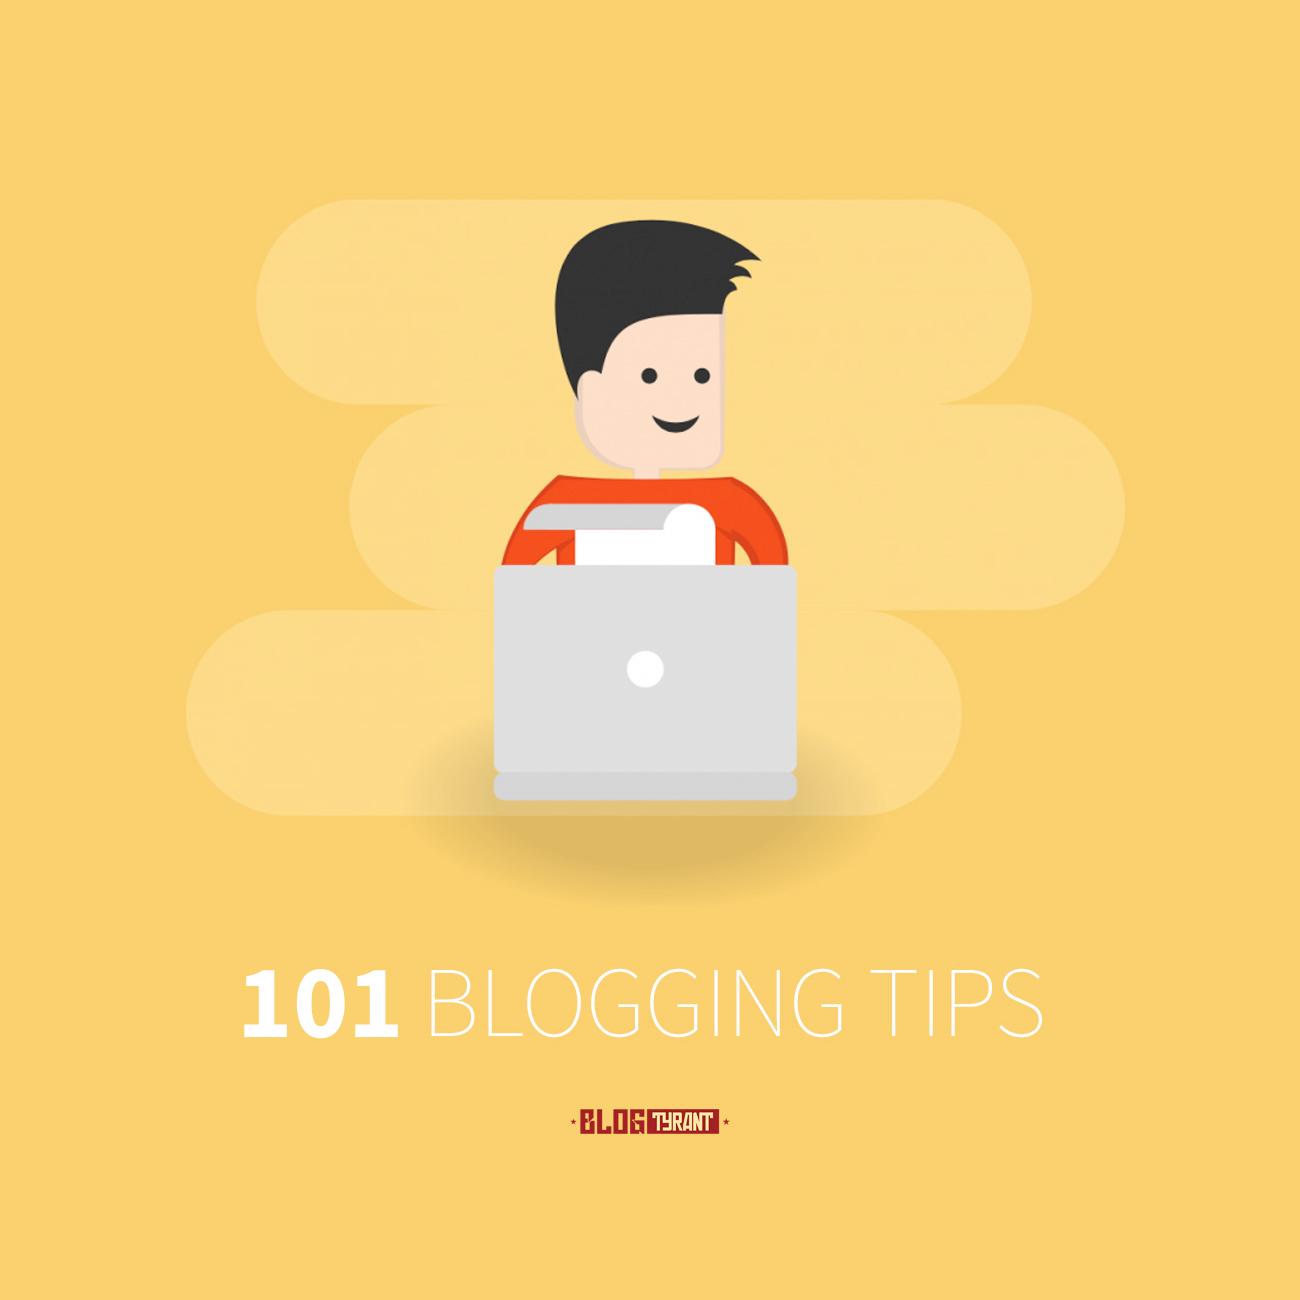 101 blogging tips